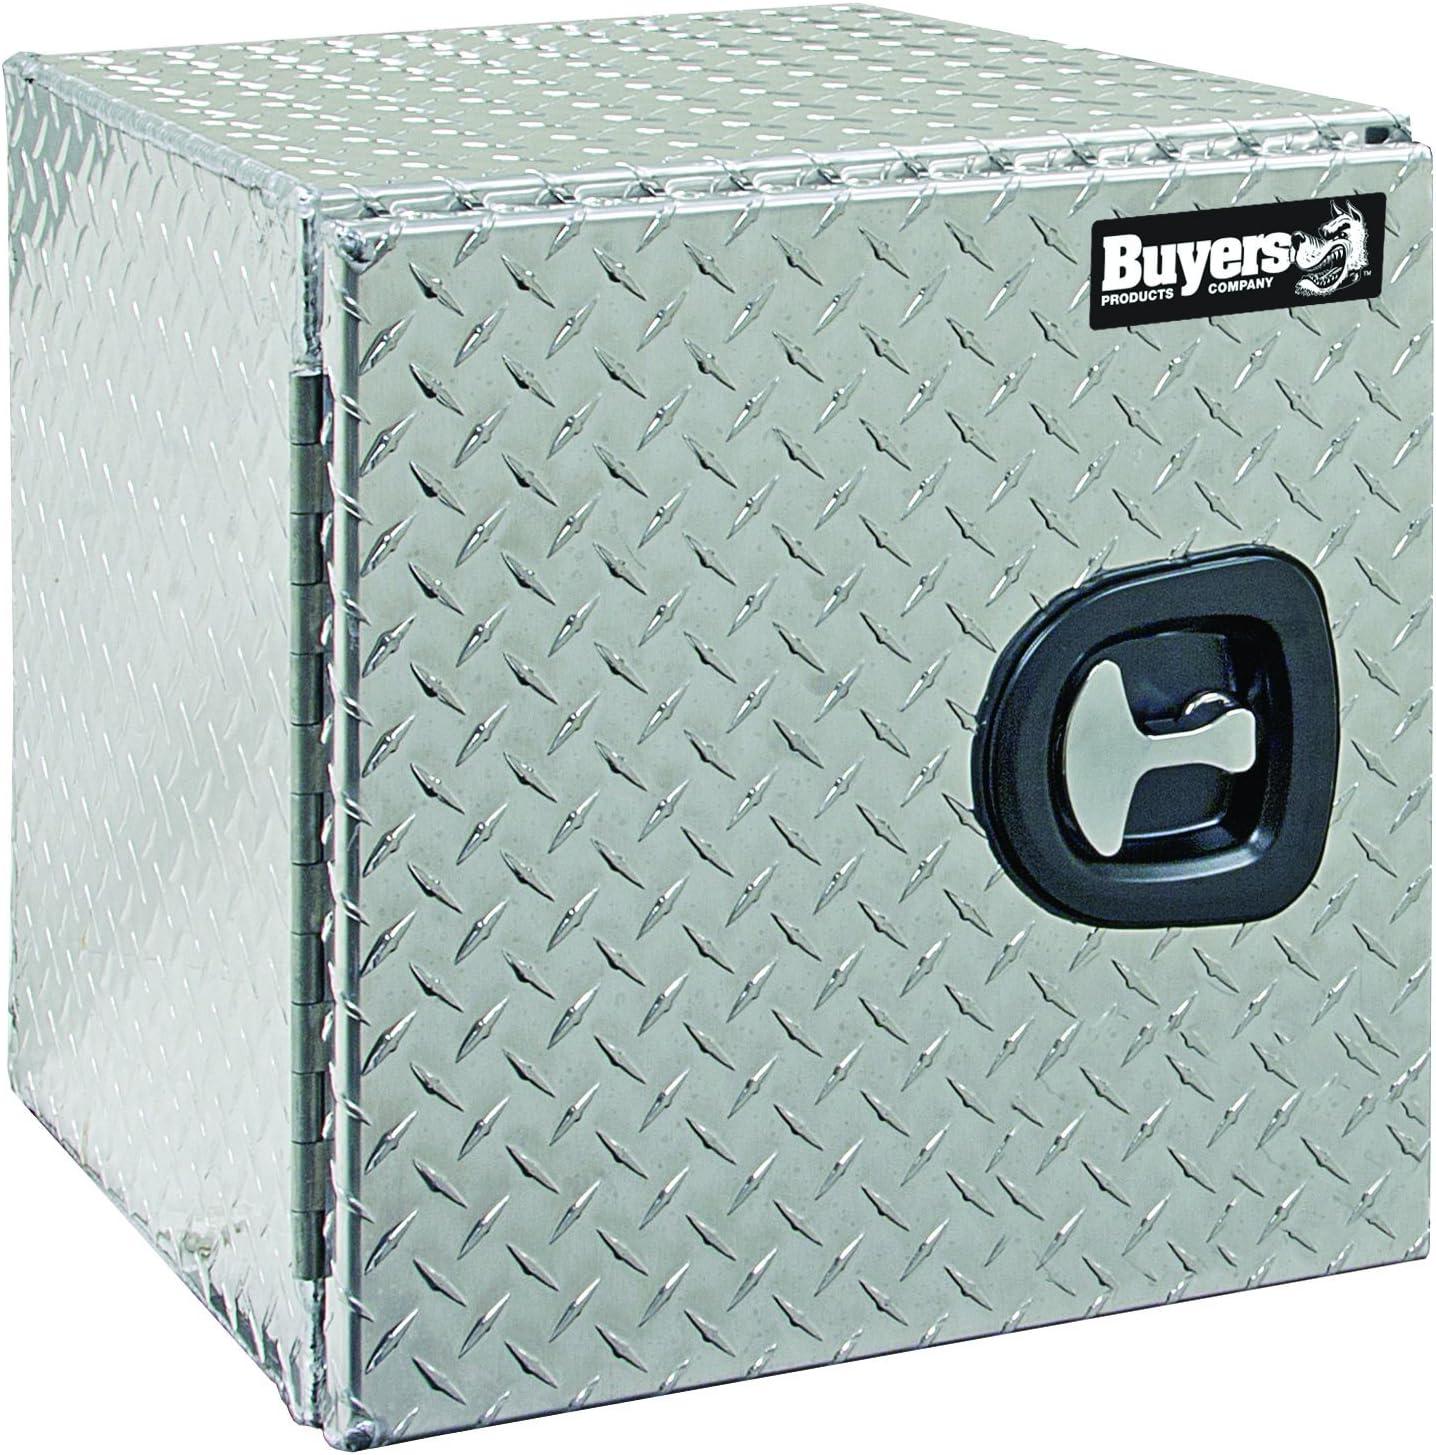 18x18x30 Inch Buyers Products Diamond Tread Aluminum Underbody Truck Box w// T-Handle Latch